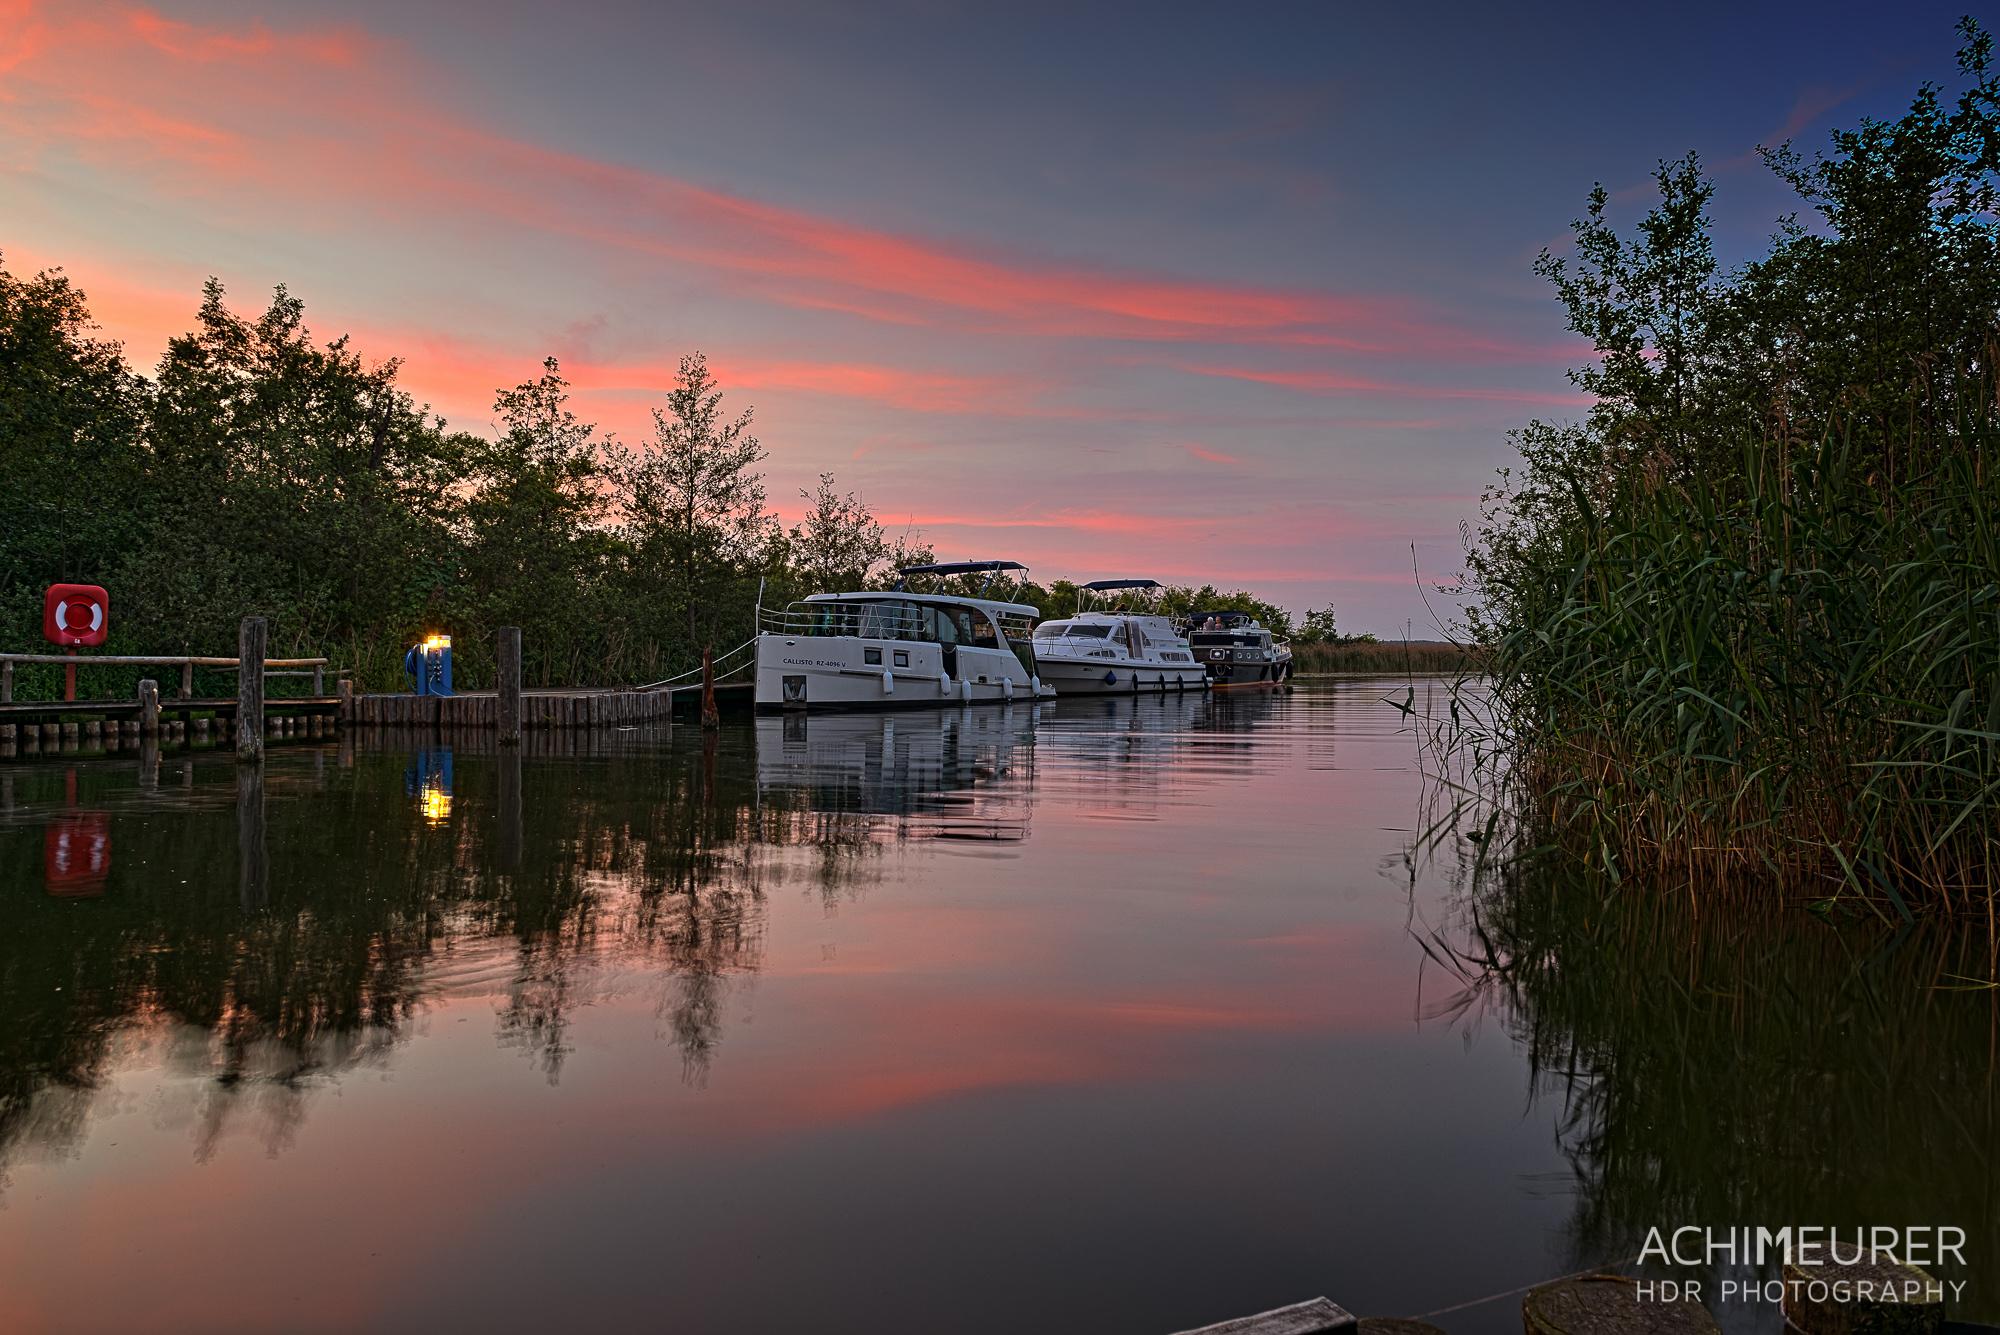 Hausboot-Kuhnle-Mueritz-Mecklenburg-Vorpommern-See_2934_3_2_1_0_HDR_20160602_224134-Bearbeitet